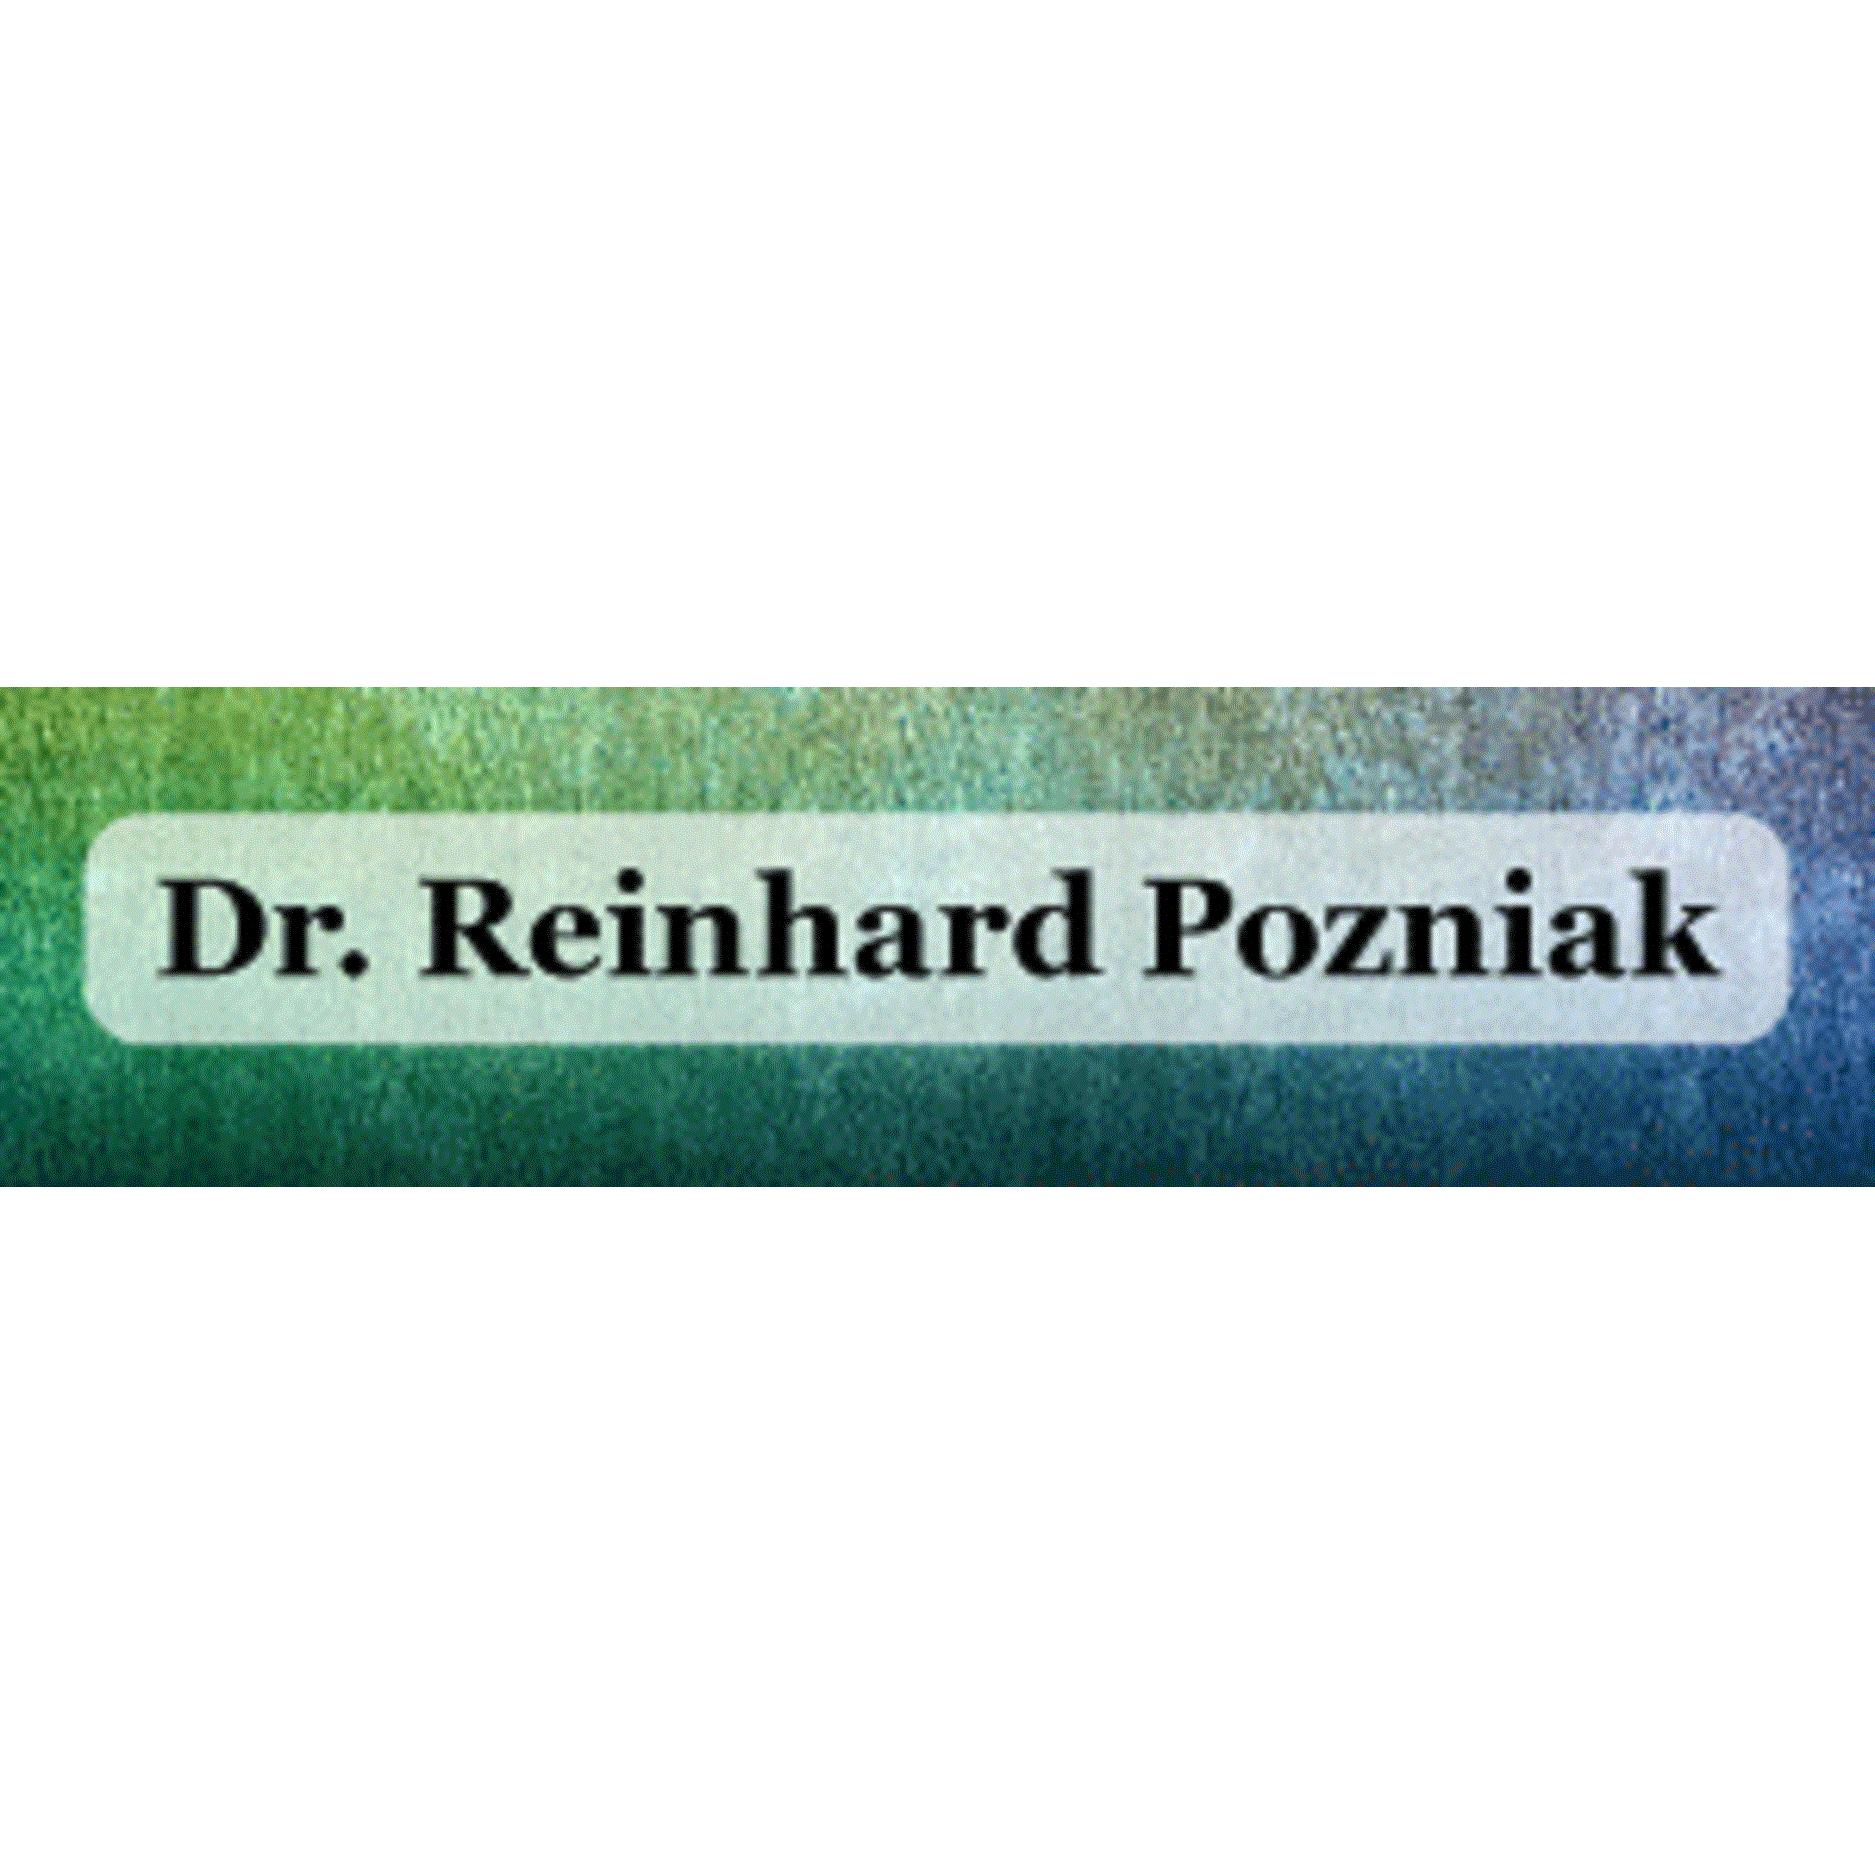 Dr. Reinhard Pozniak in Krems an der Donau - Logo